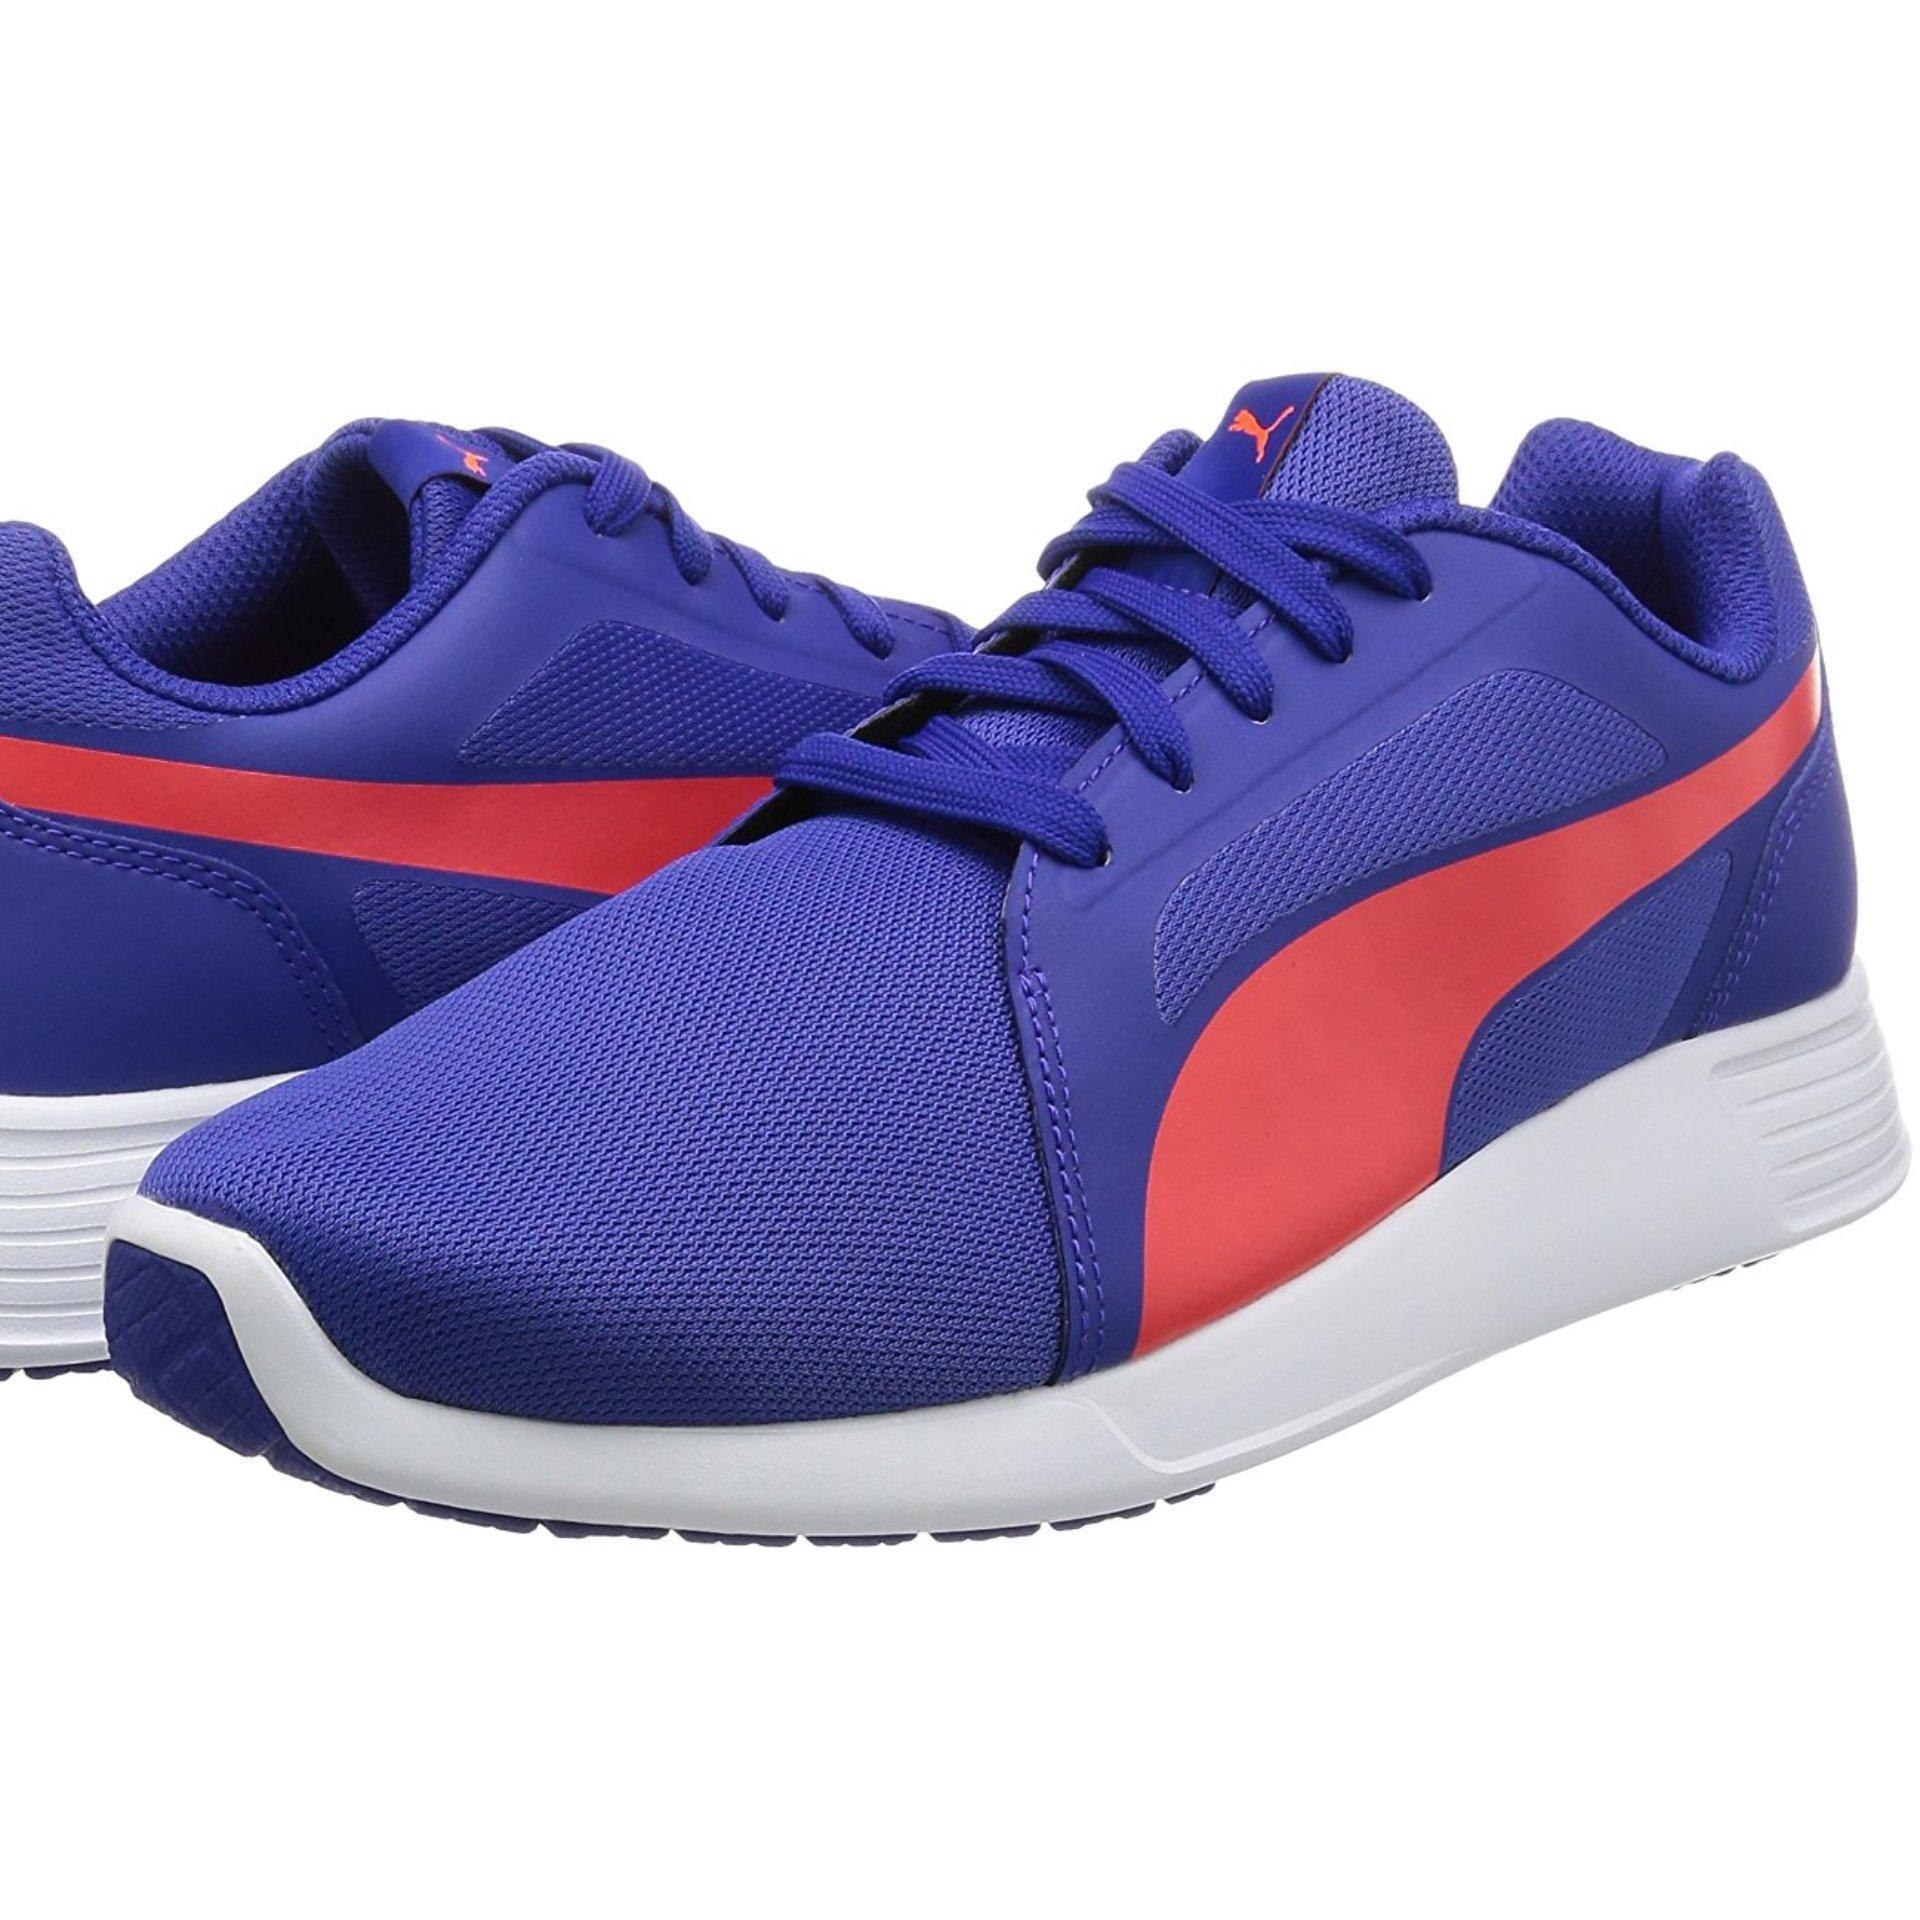 Puma St Trainer Evo V2 Slip On Sepatu Lari Pria Toreador Shoes Pacer Barbados Cherry Merah Training 35990415 Biru